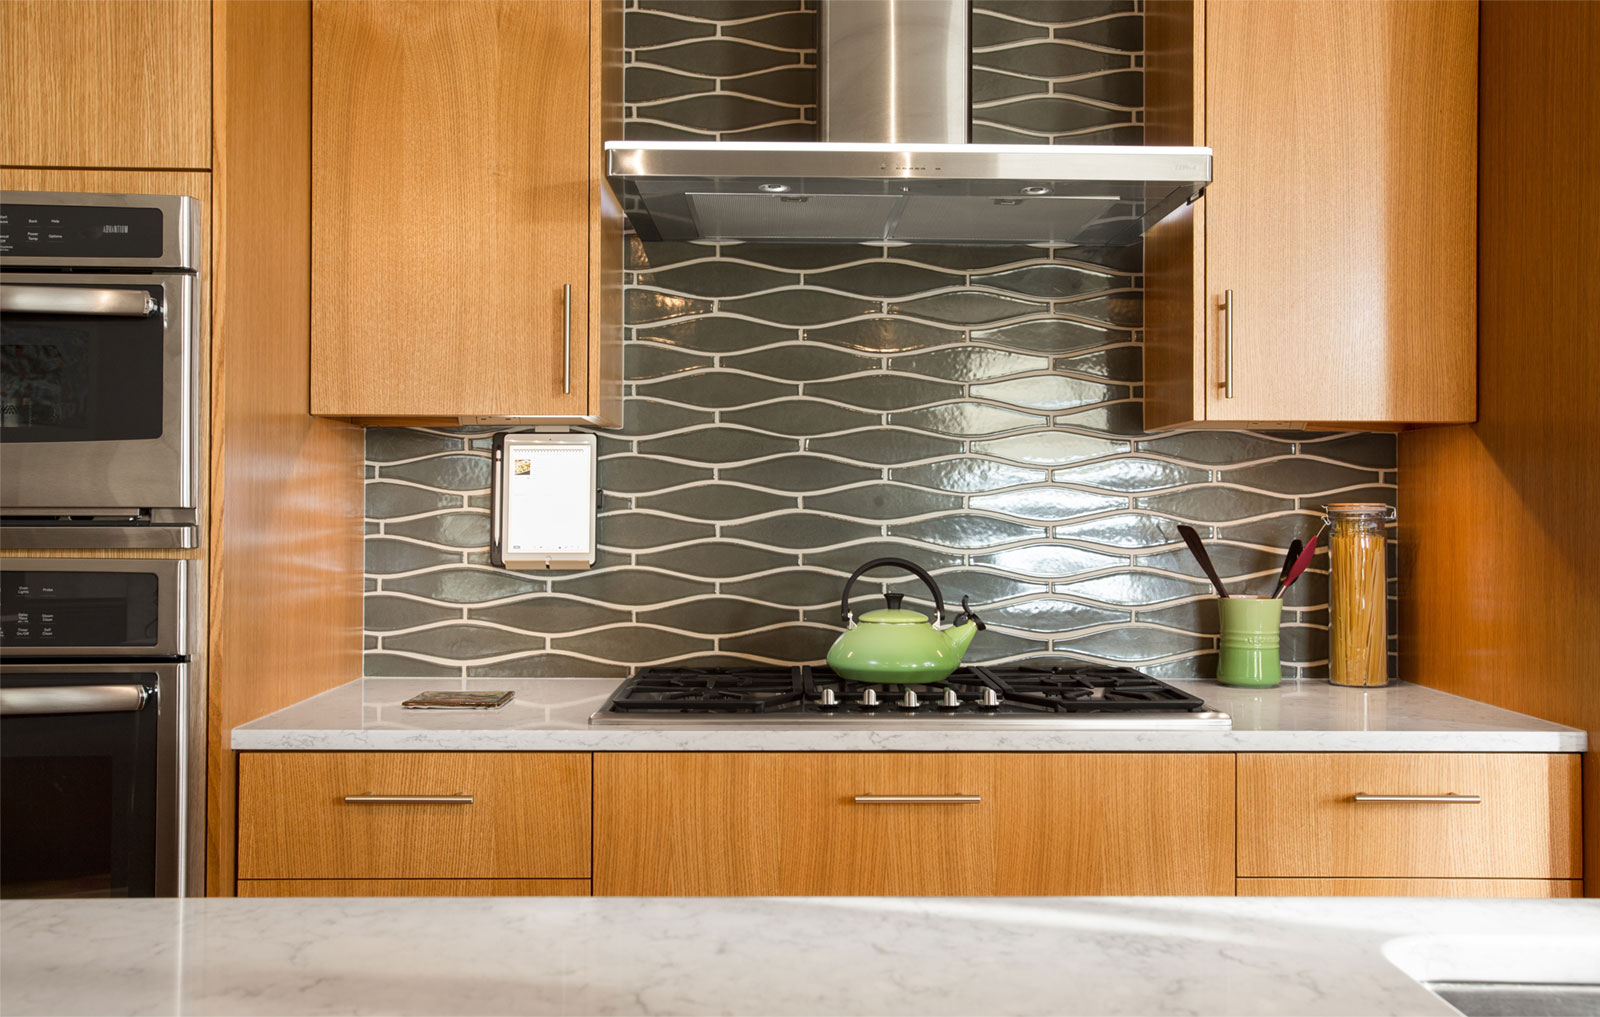 modern kitchen design - Henderer Design + Build, Corvallis OR